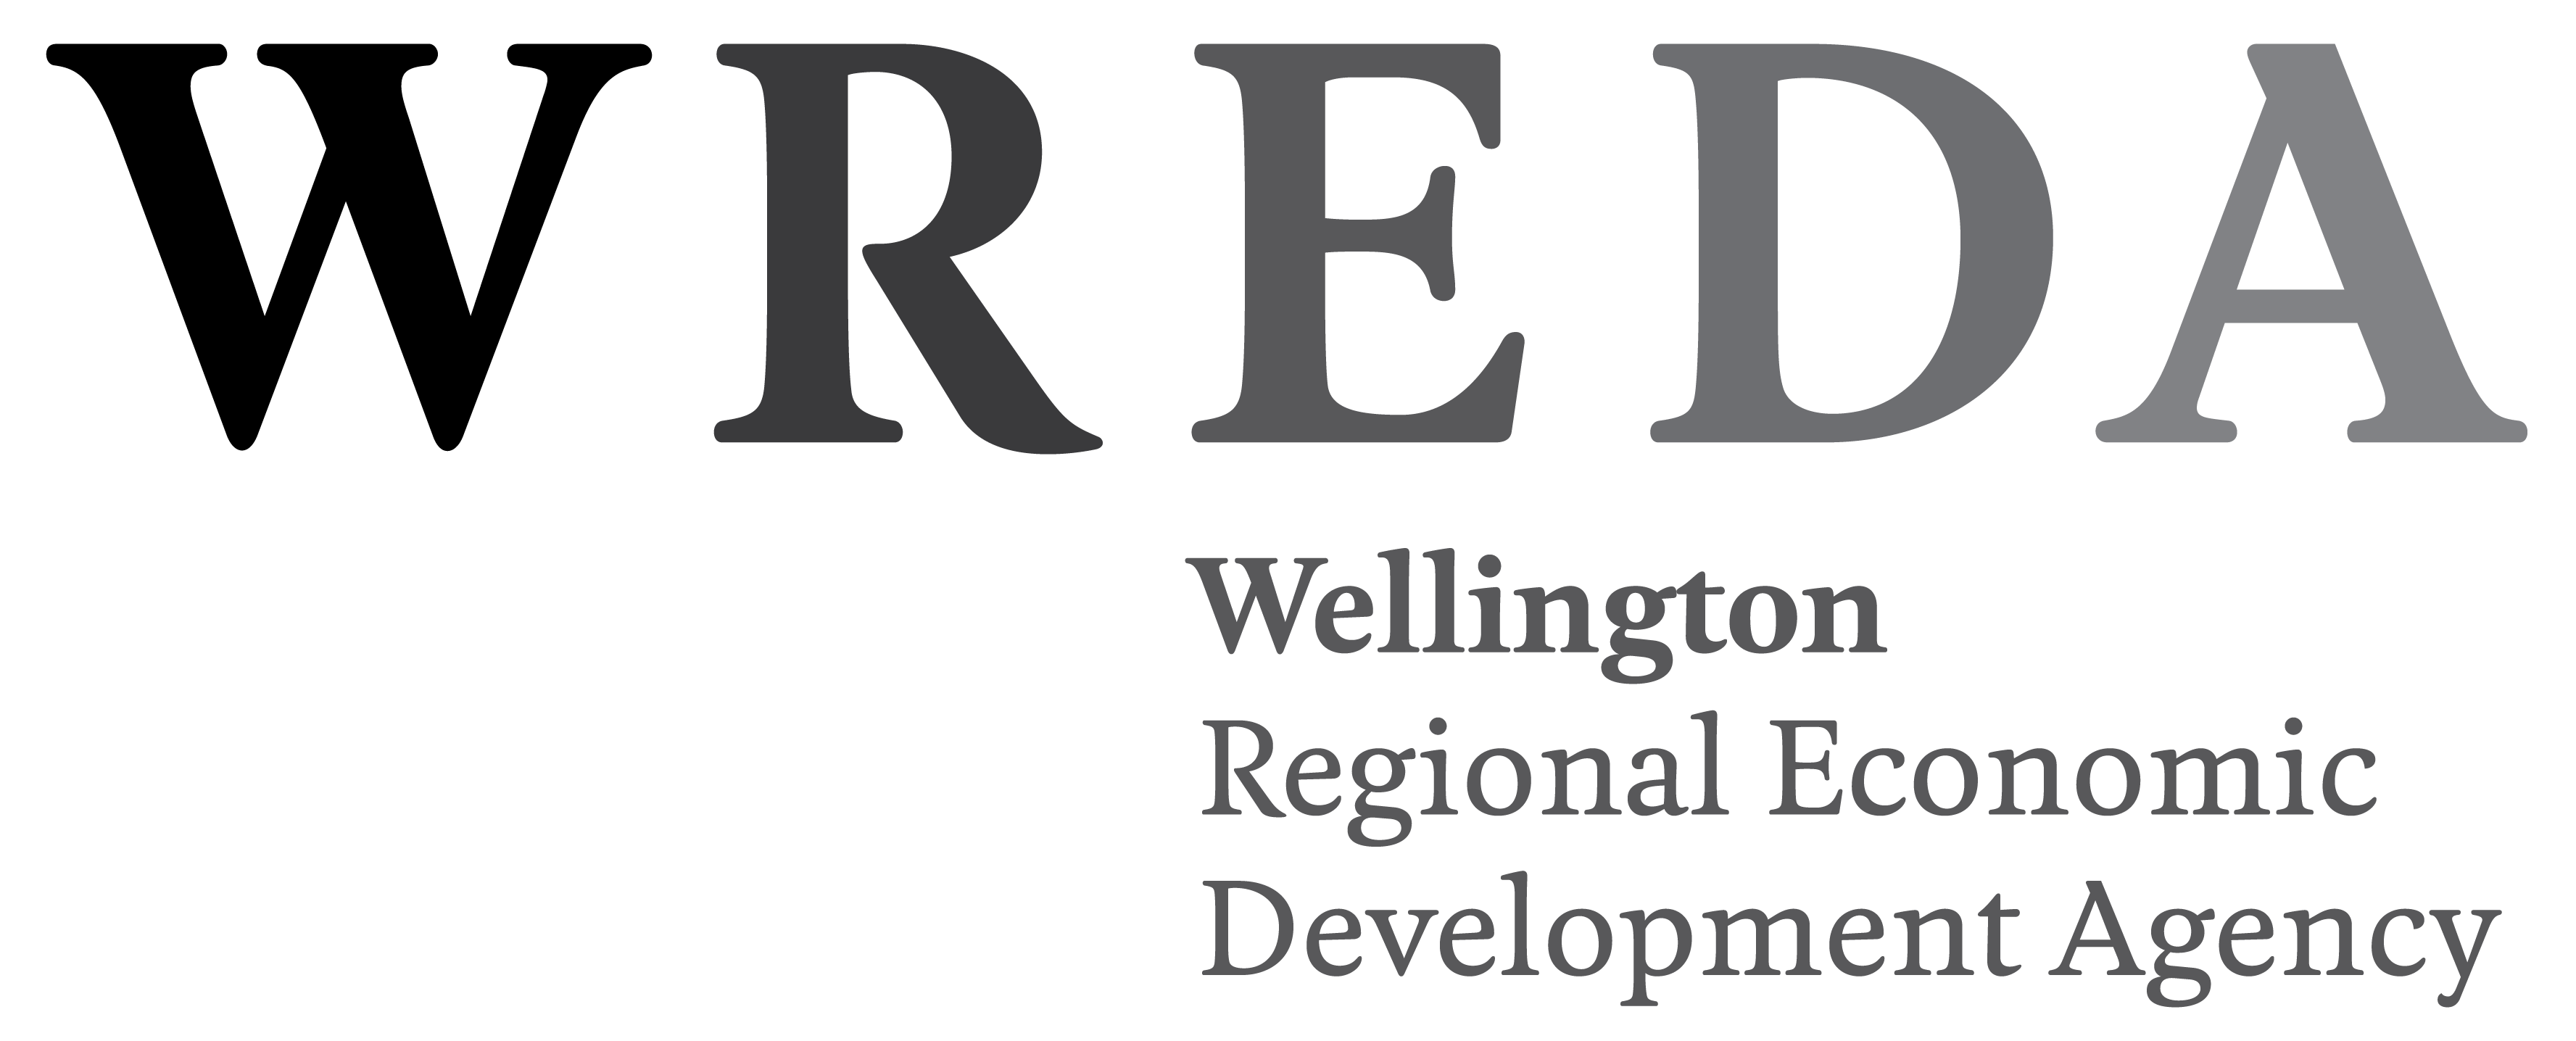 WREDA Wellington Regional Economic Development Agency